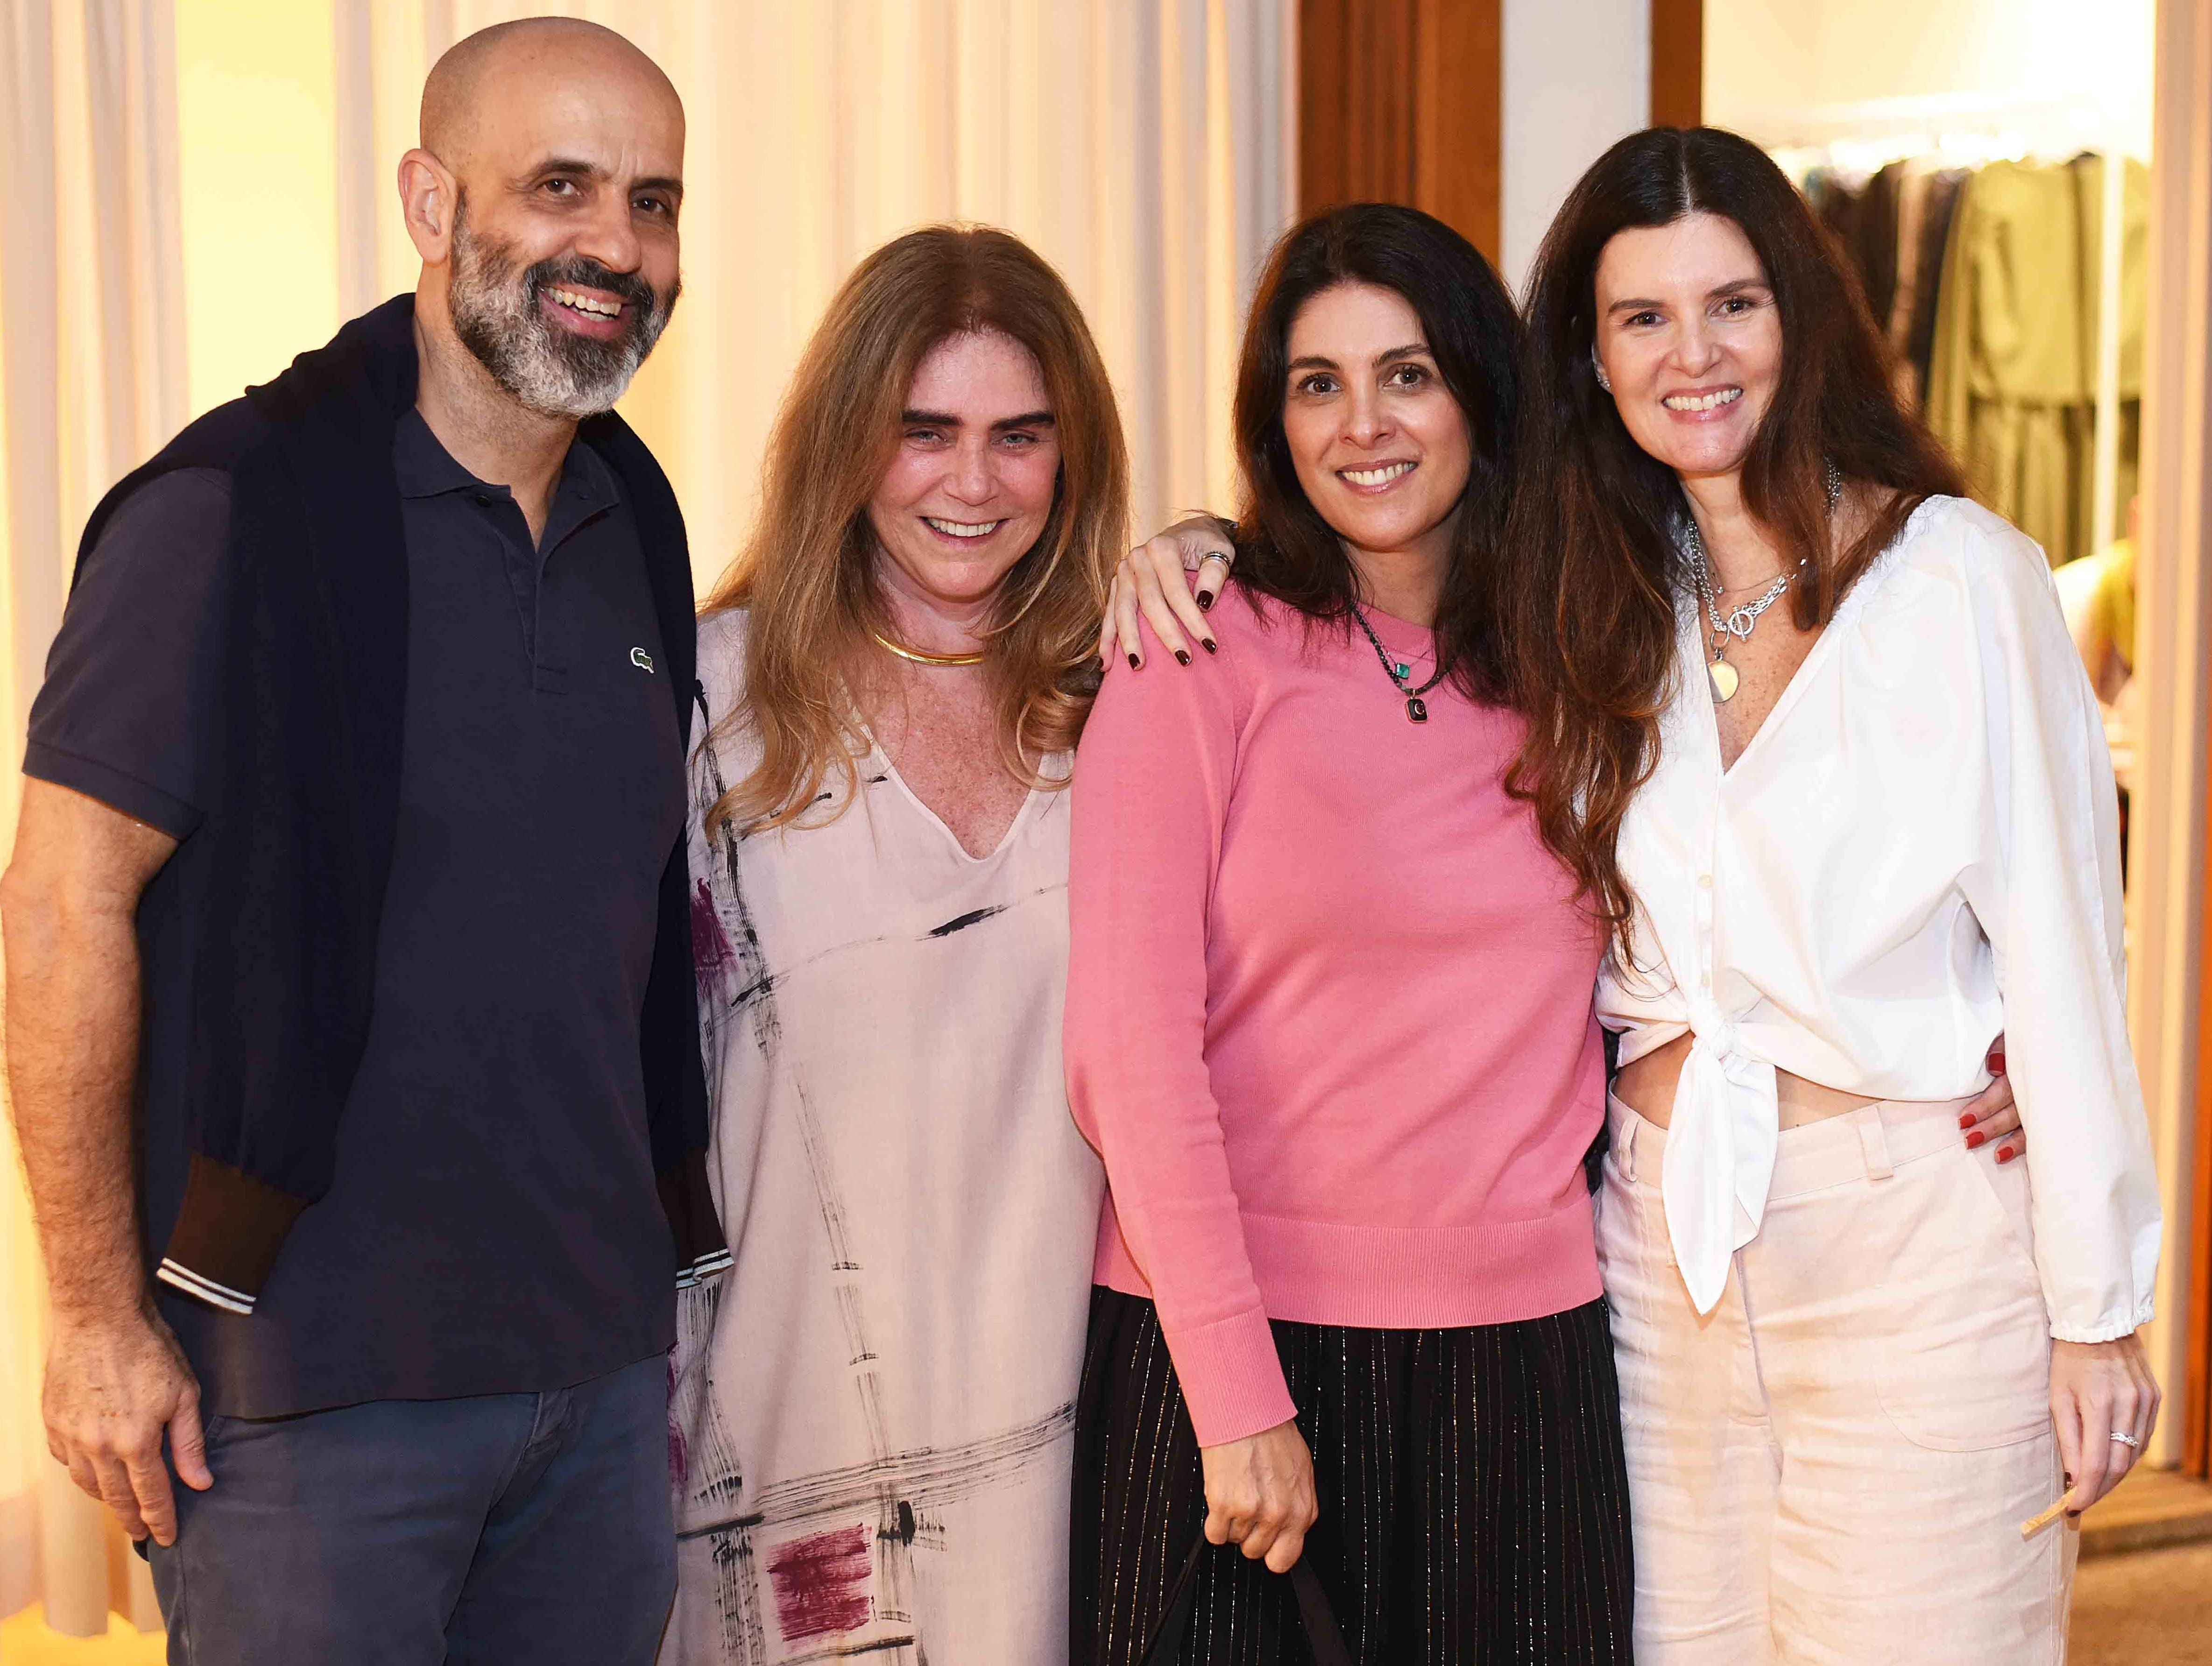 Claudio Gomes, Maria Cecilia Brafman, Ana Gabriela Vianna e Manuela Noronha /Foto: Ari Kaye